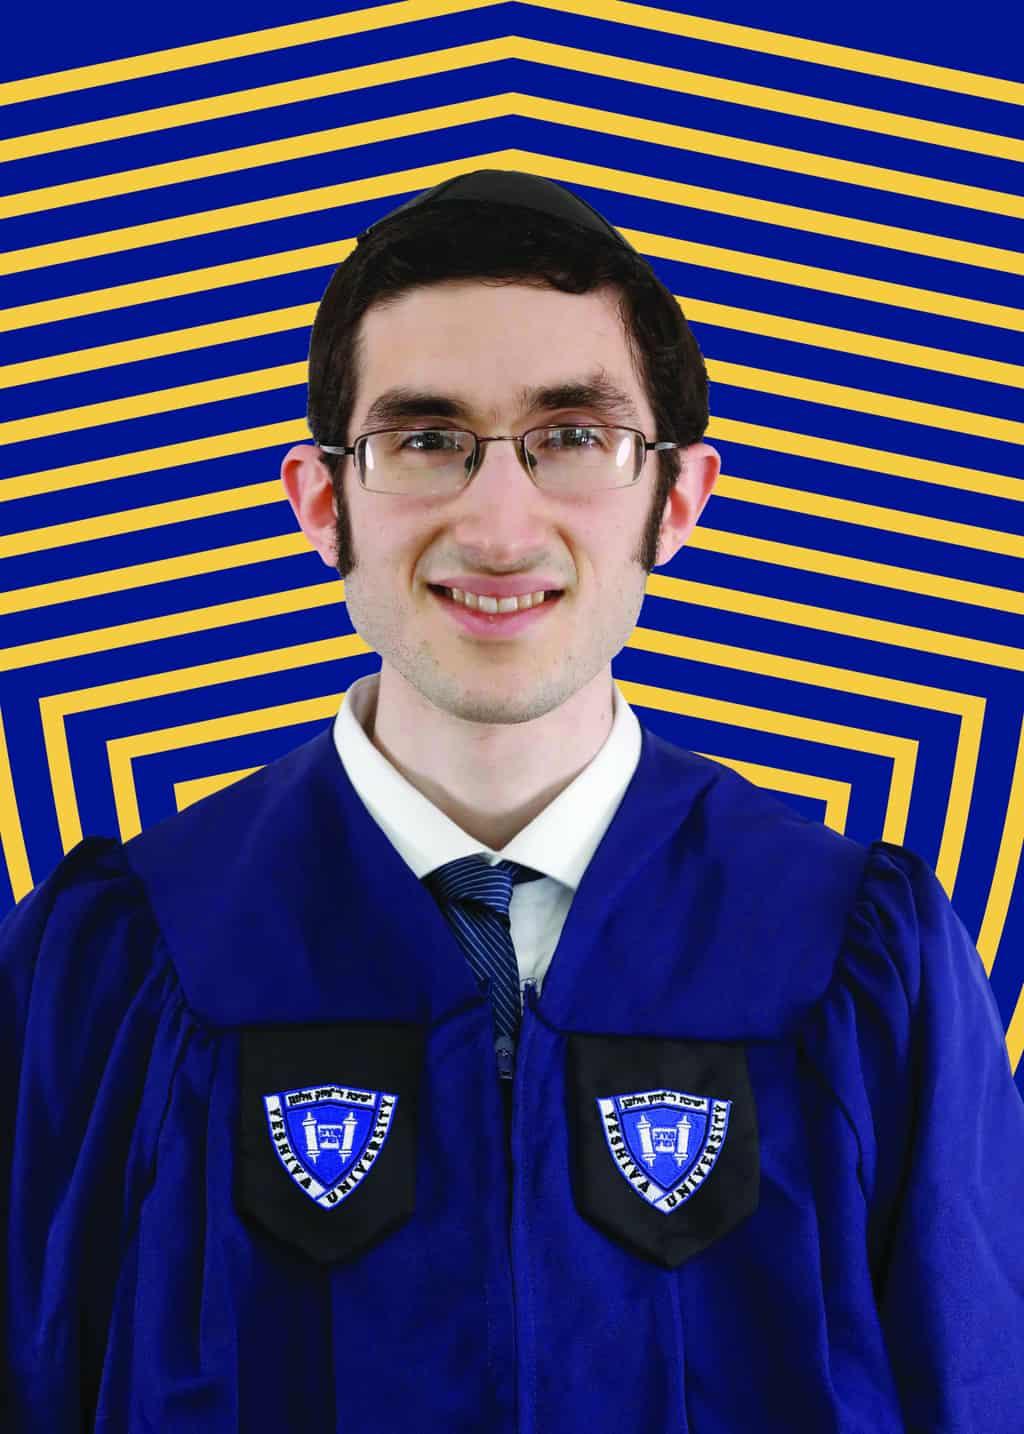 memphian-one-of-nine-yeshiva-university-graduates-named-valedictorians-for-outstanding-academic-achievements